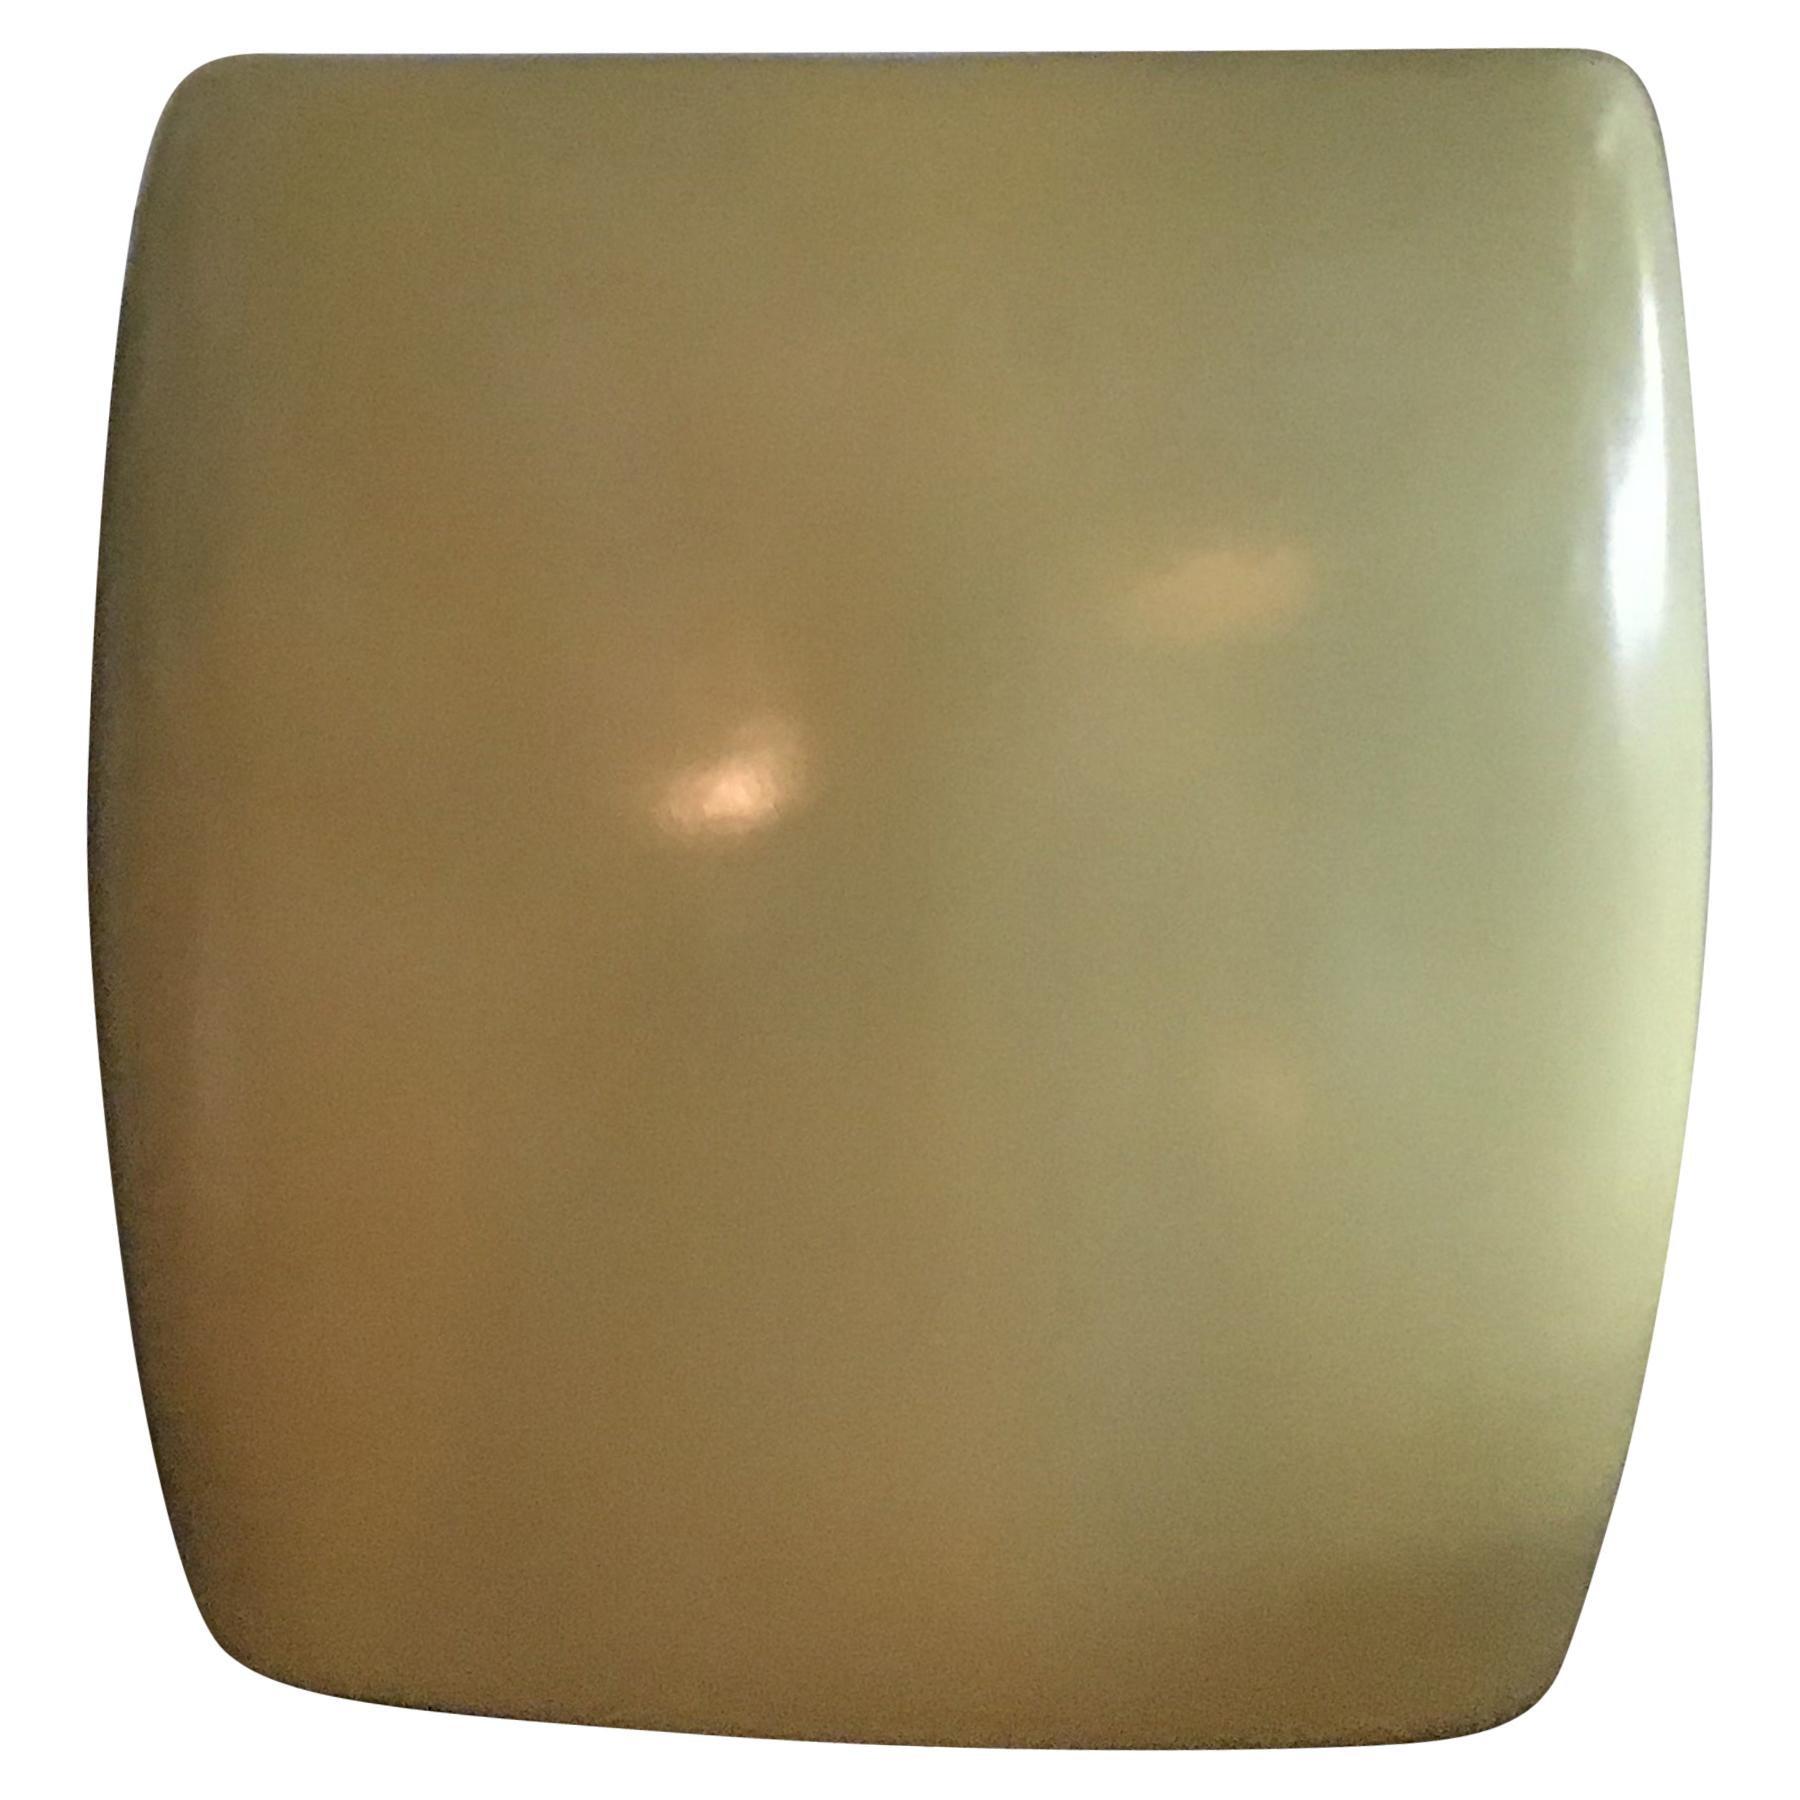 Laveno Guido Andlovitz 1935 Large Vase/Umbrella Stand Yellow Ceramic, Italy